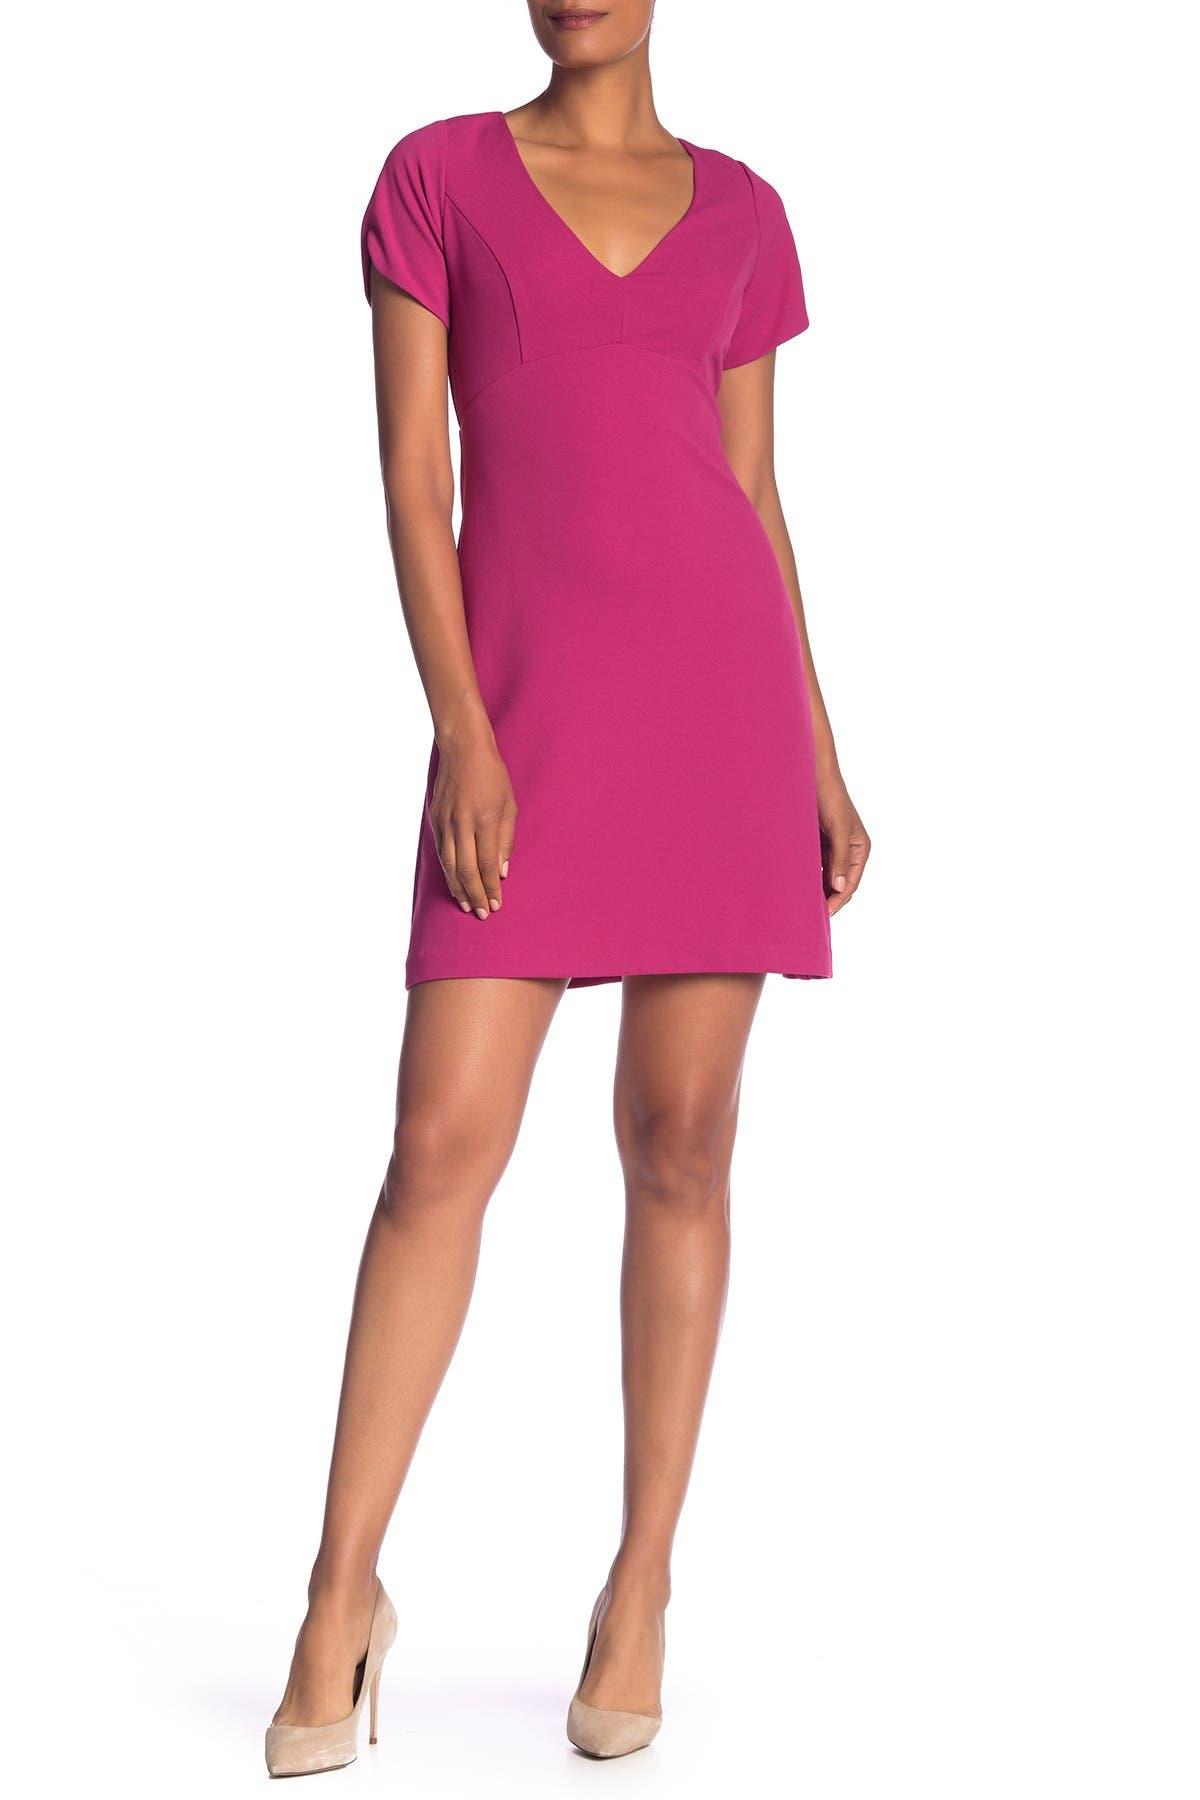 Image of Betsey Johnson V-Neck Crepe Dress